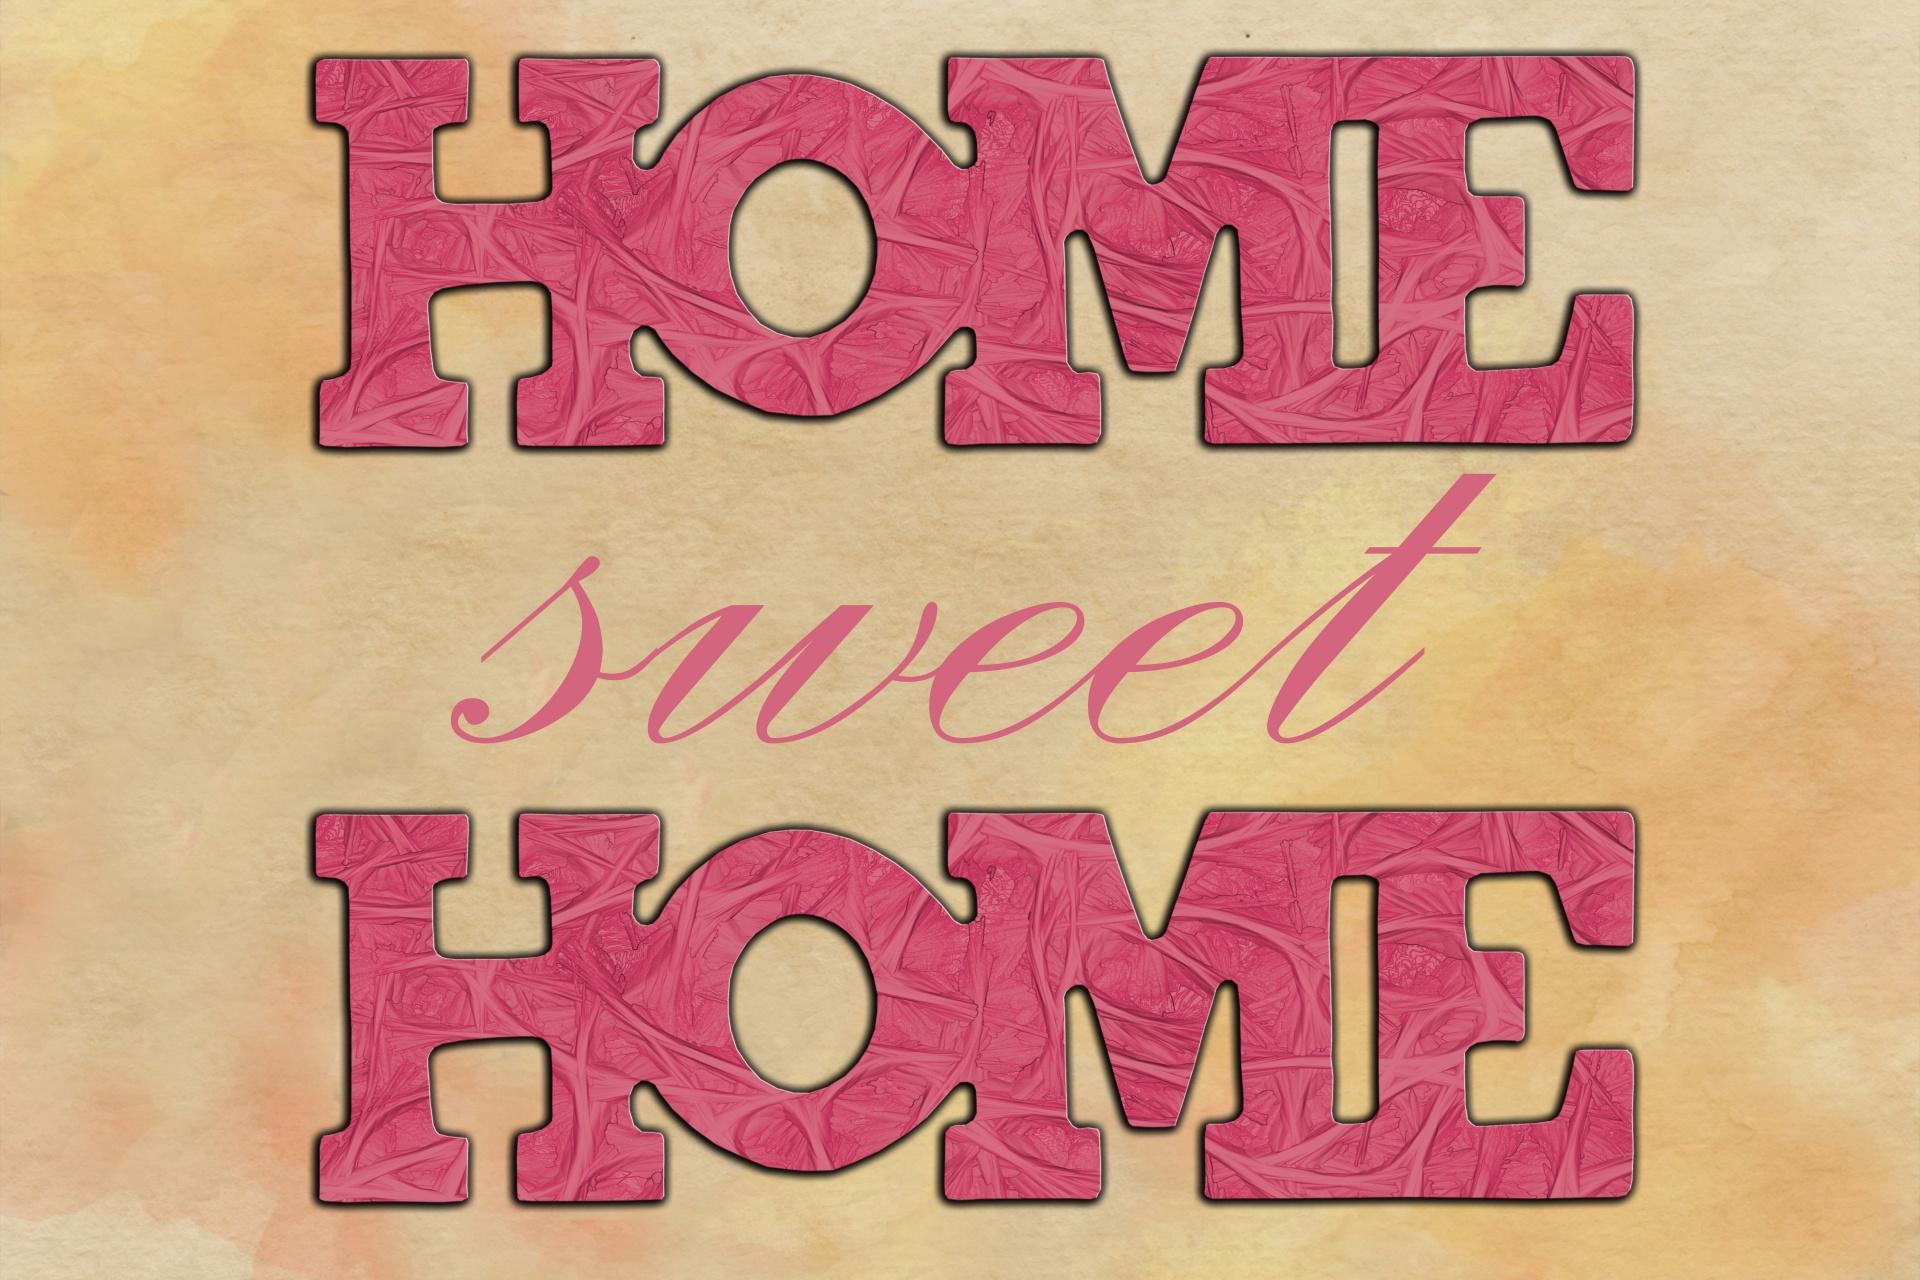 home-sweet-home-1456862578eiX.jpg